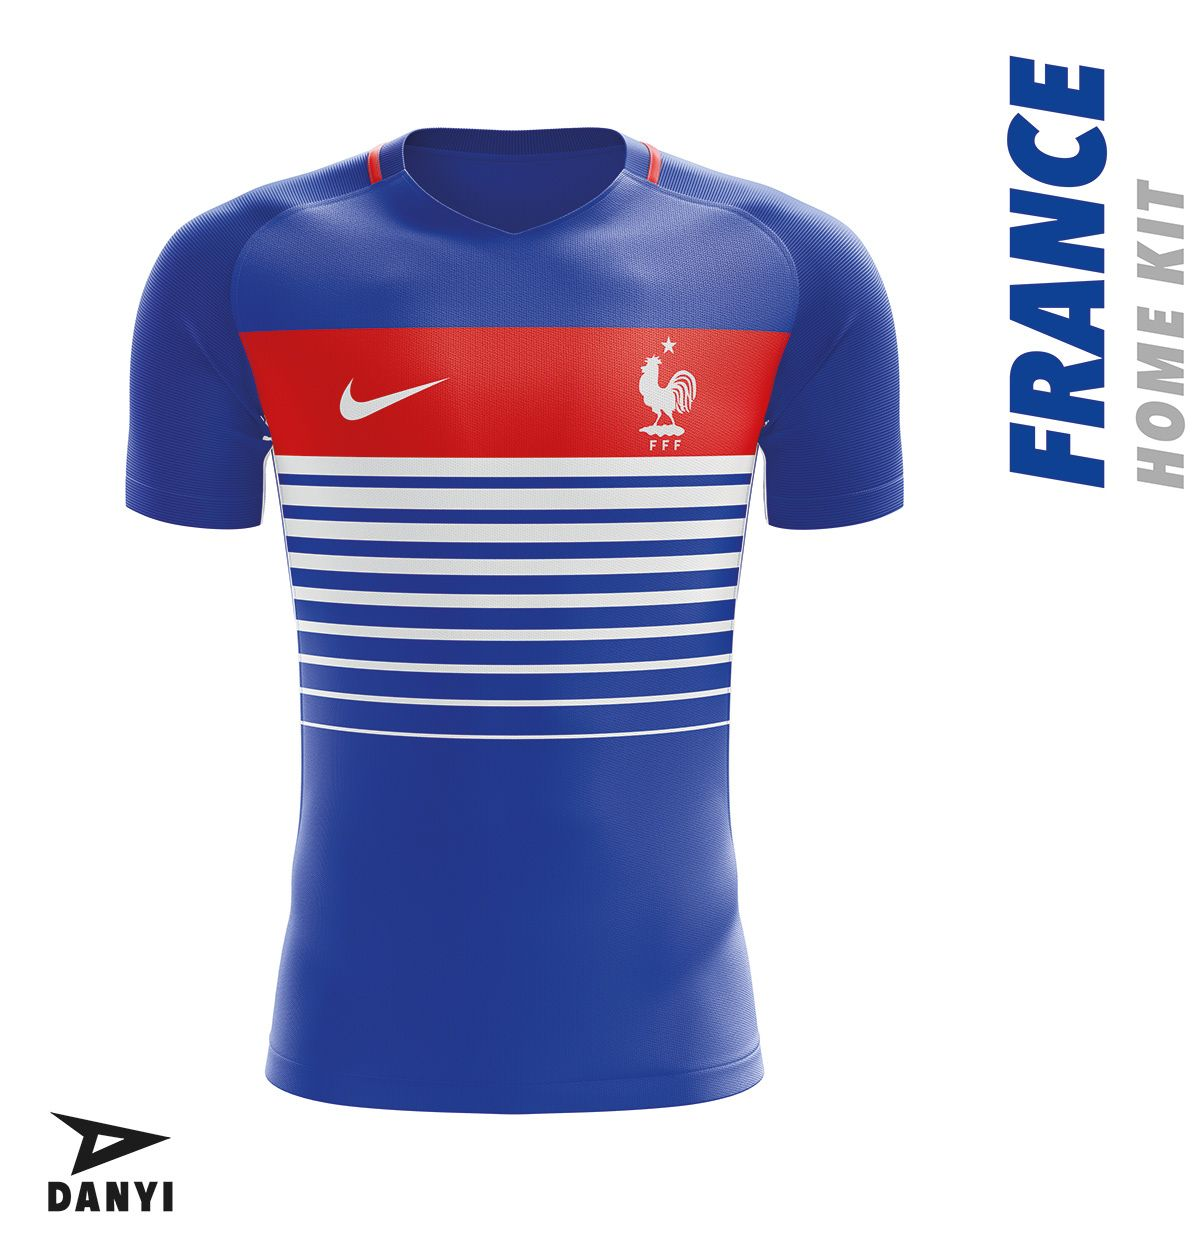 World Cup Kits 2018 On Behance Camisetas Deportivas Camisa De Futbol Uniformes De Futbol